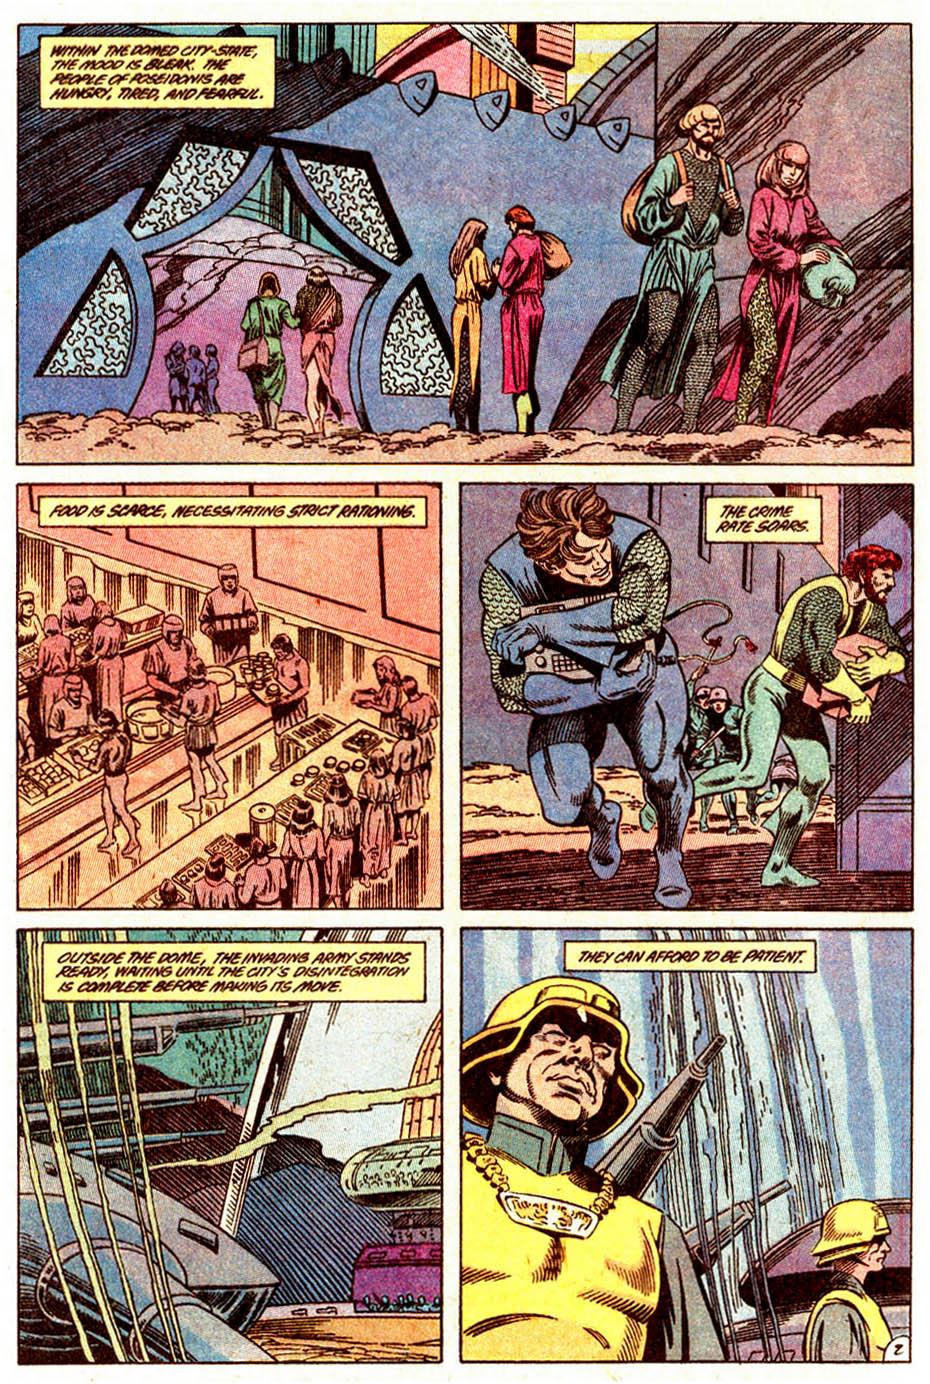 Read online Aquaman (1989) comic -  Issue #4 - 3